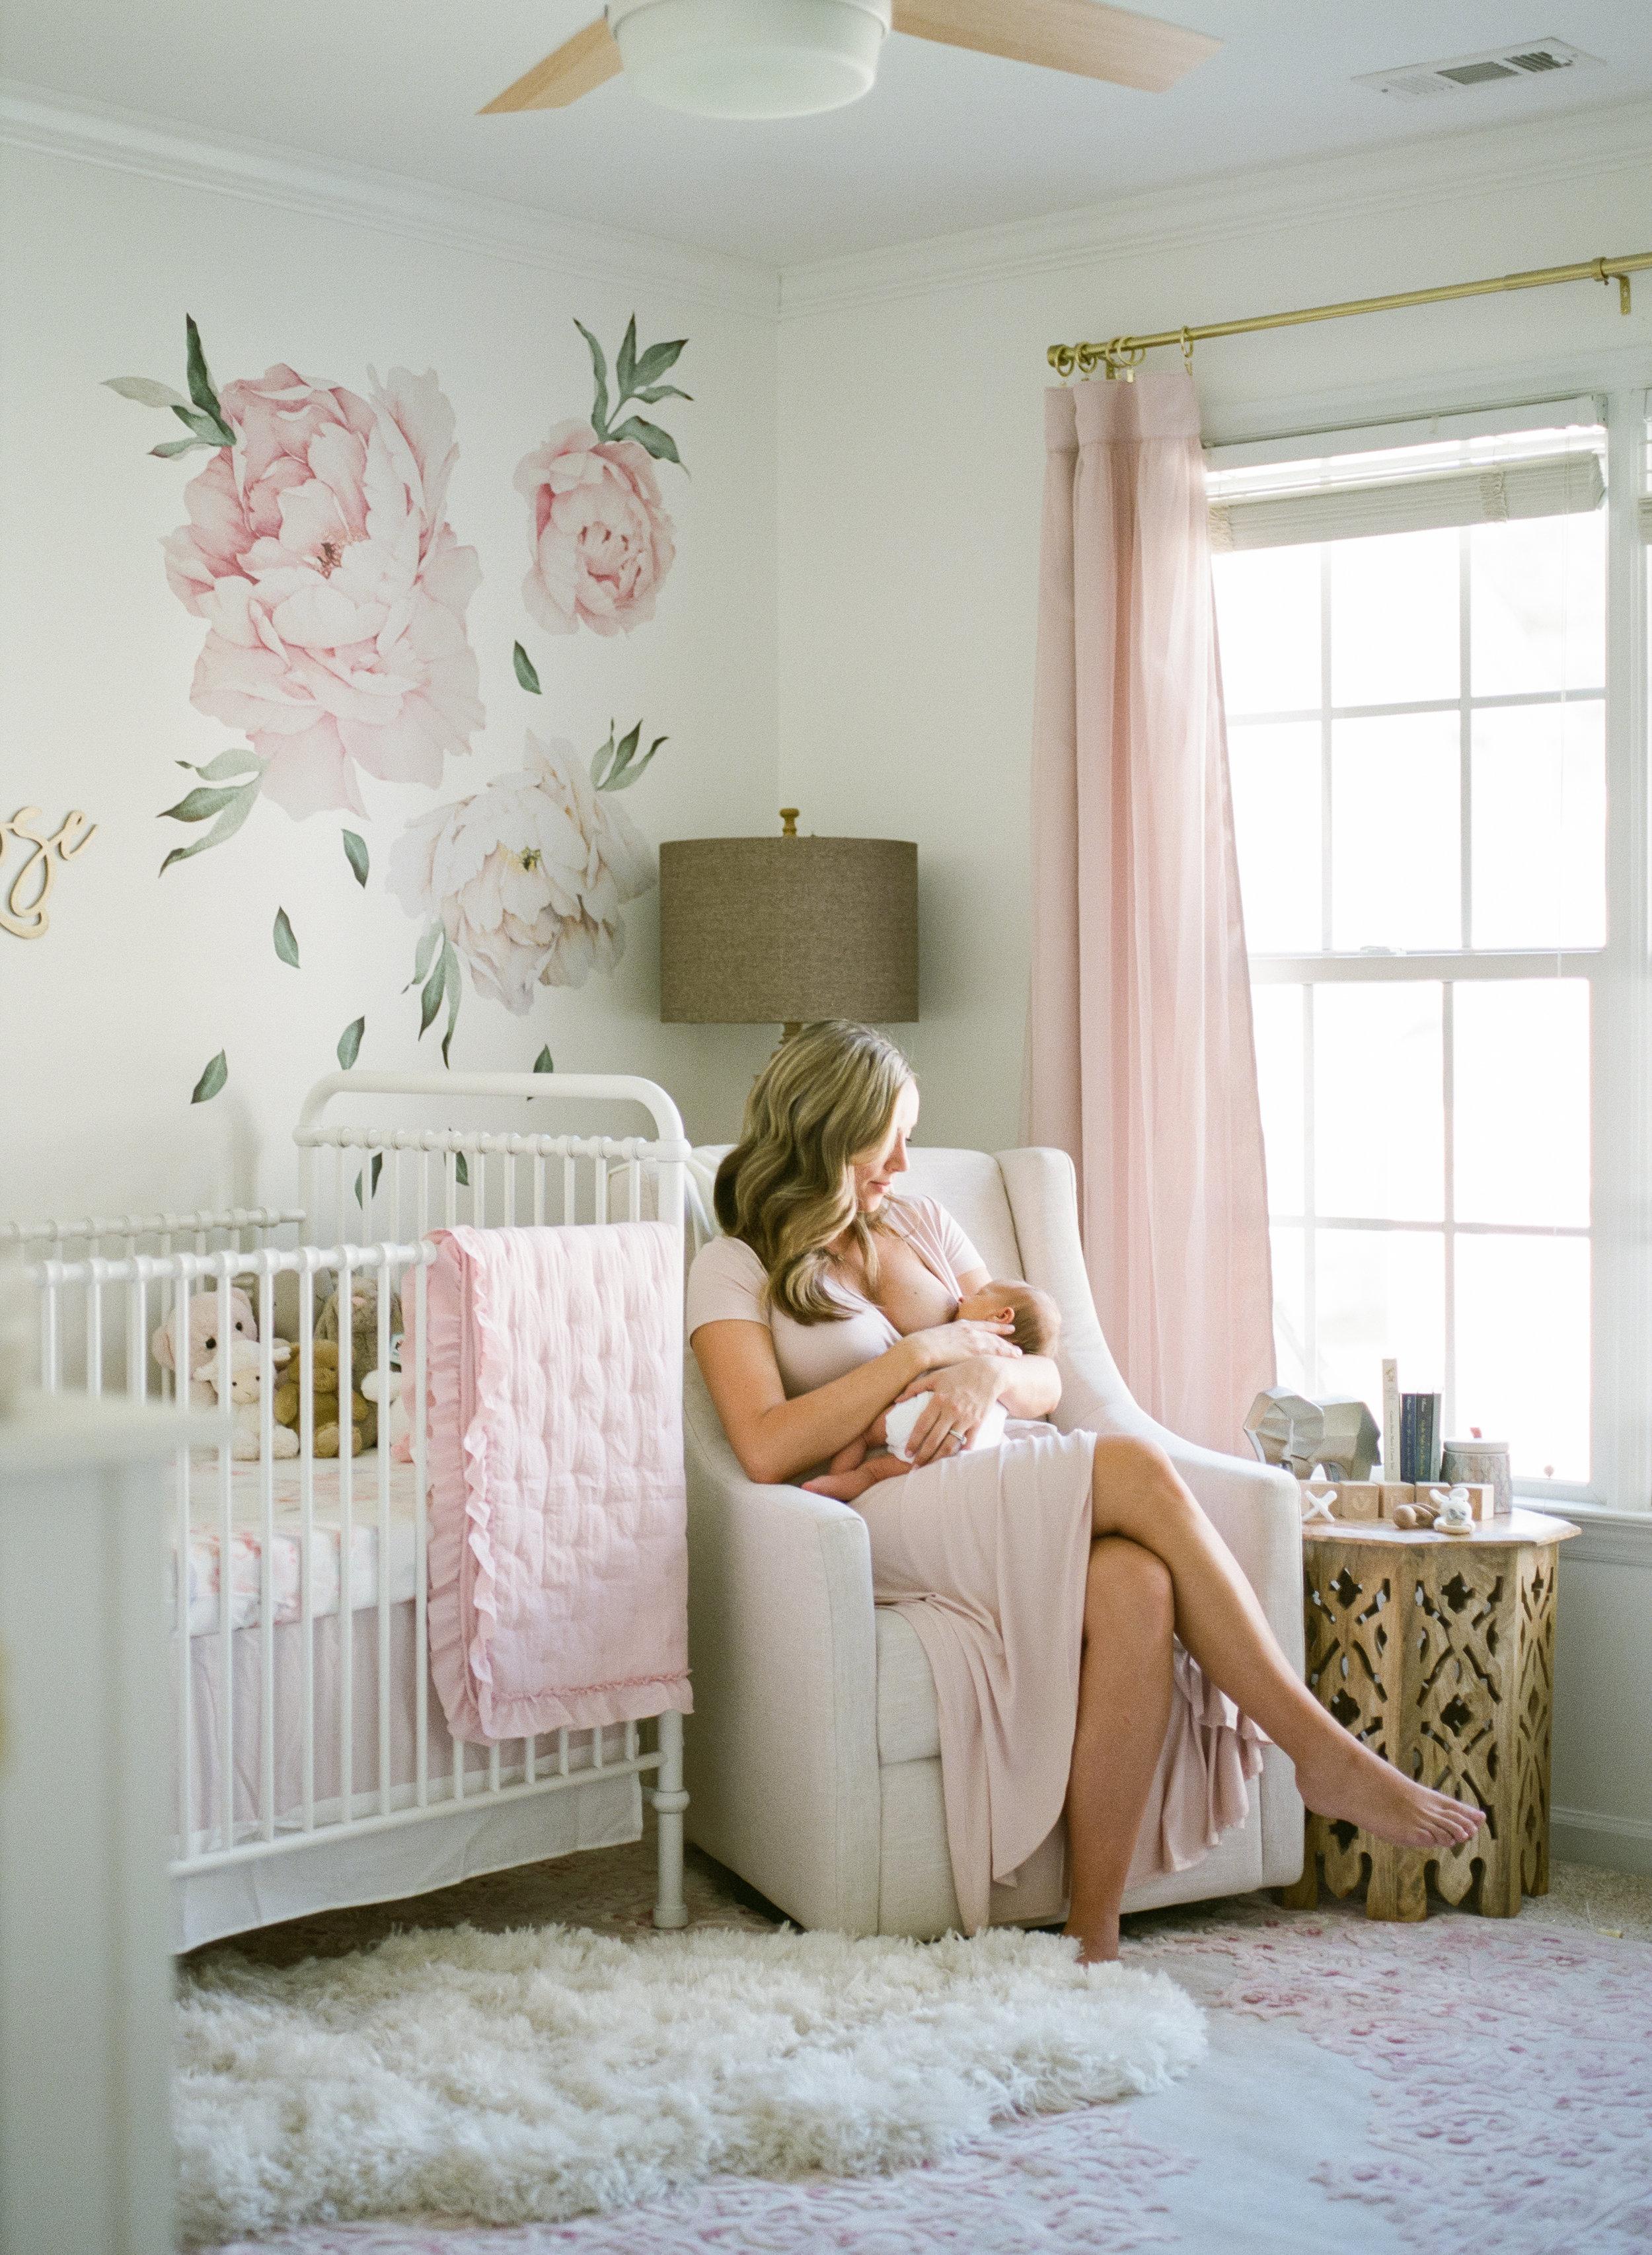 raleigh-newborn-photographer-baby-beautiful-nursery-floral-wallpaper-photography